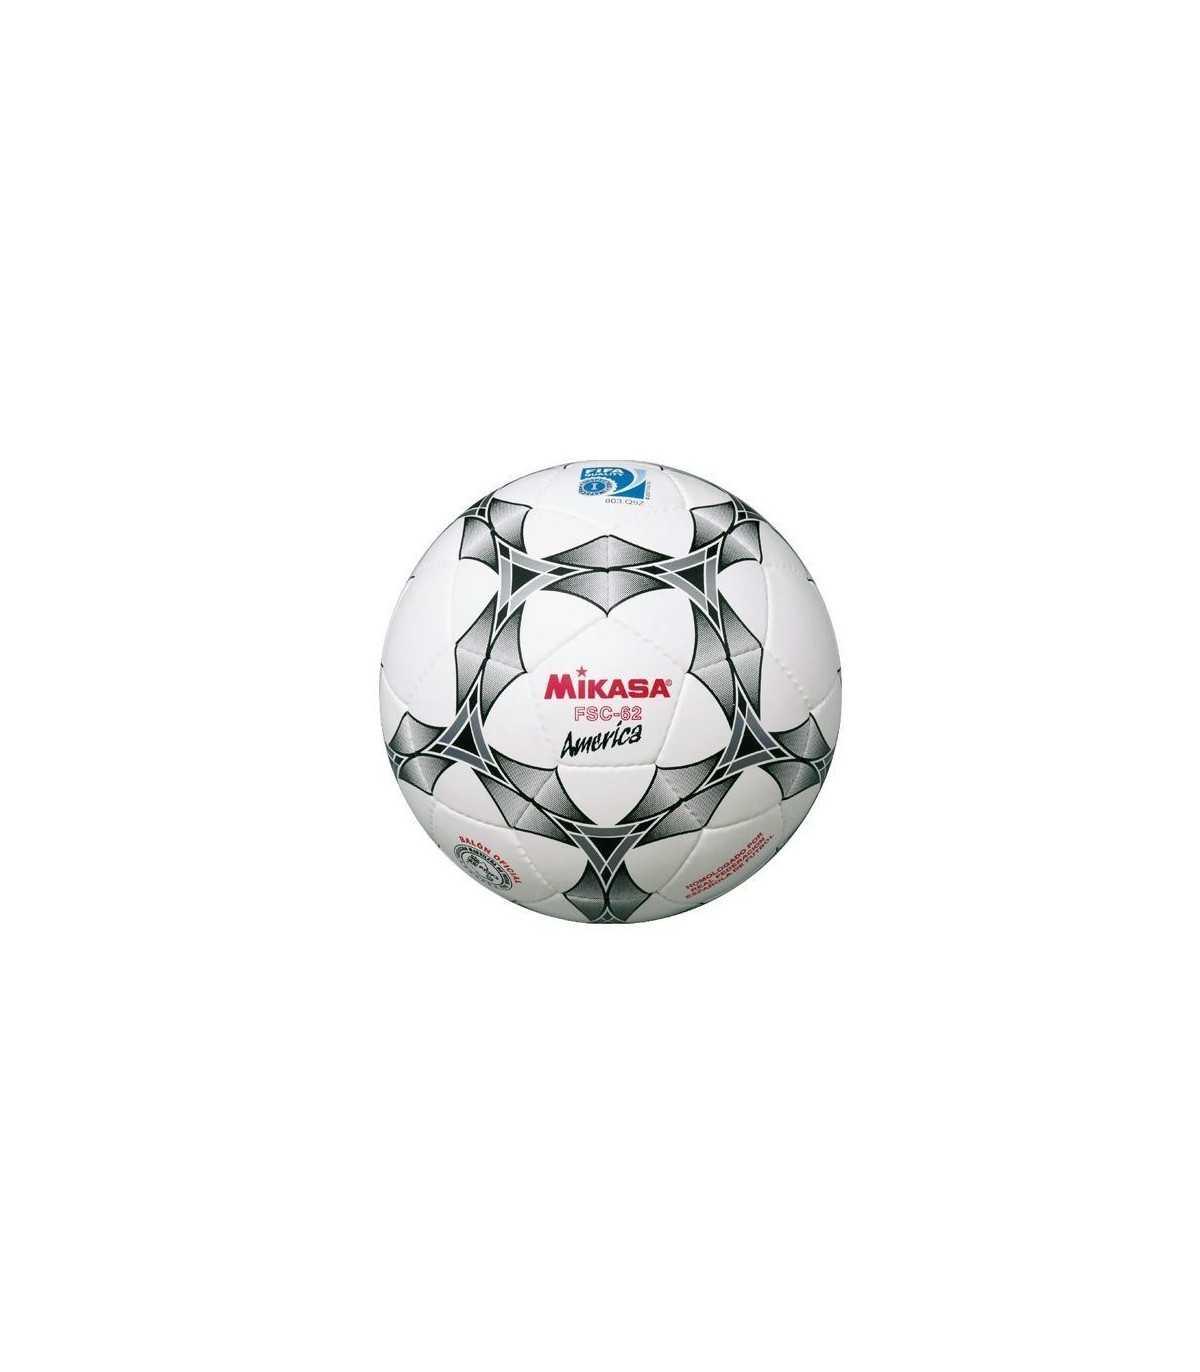 BALÓN MIKASA FSC-62 AMERICA 35b3d68bd7cce